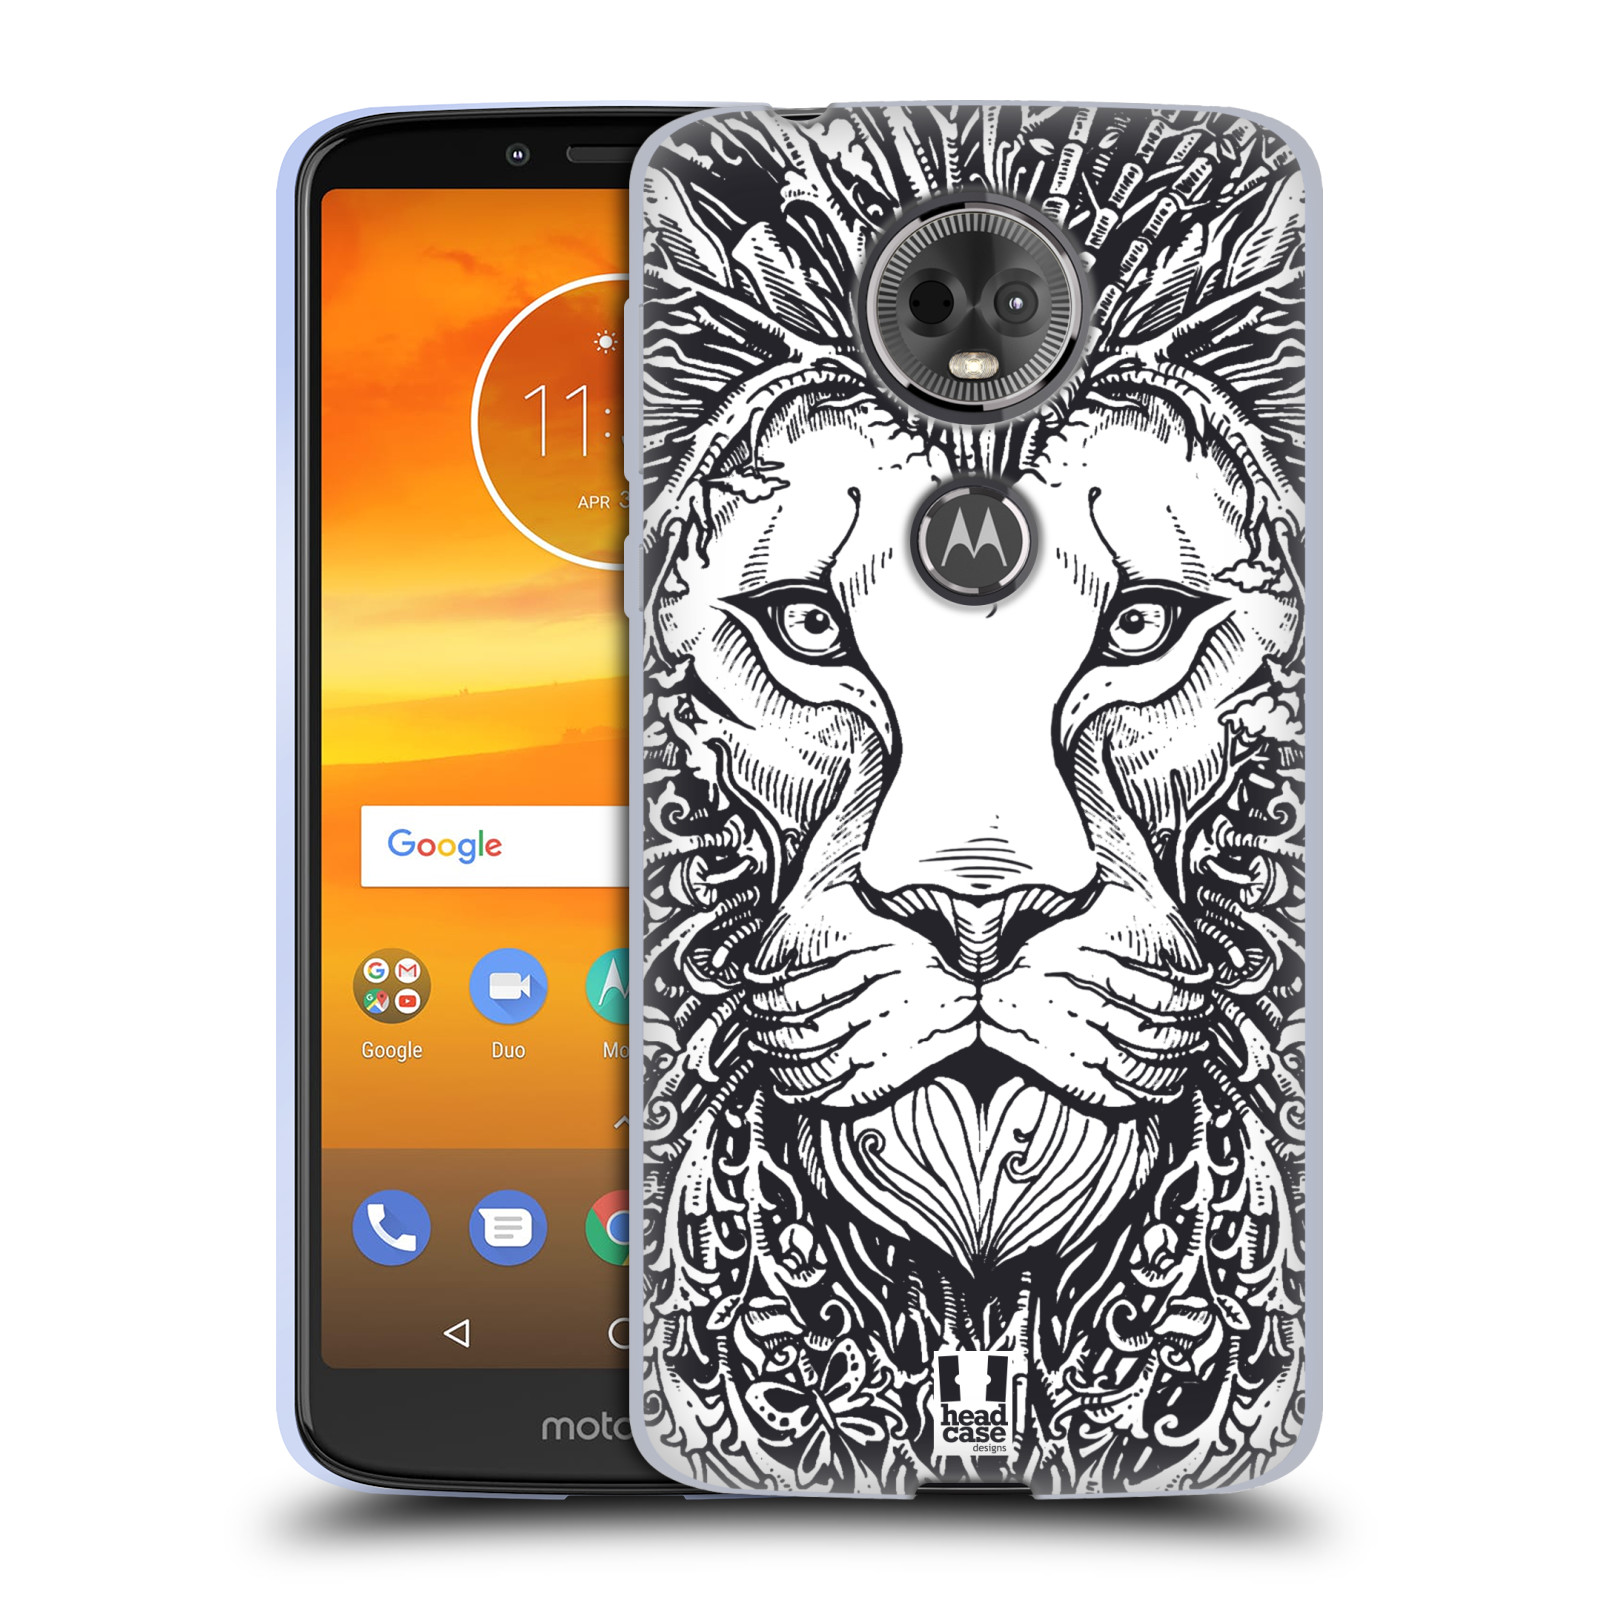 Silikonové pouzdro na mobil Motorola Moto E5 Plus - Head Case - DOODLE TVÁŘ LEV